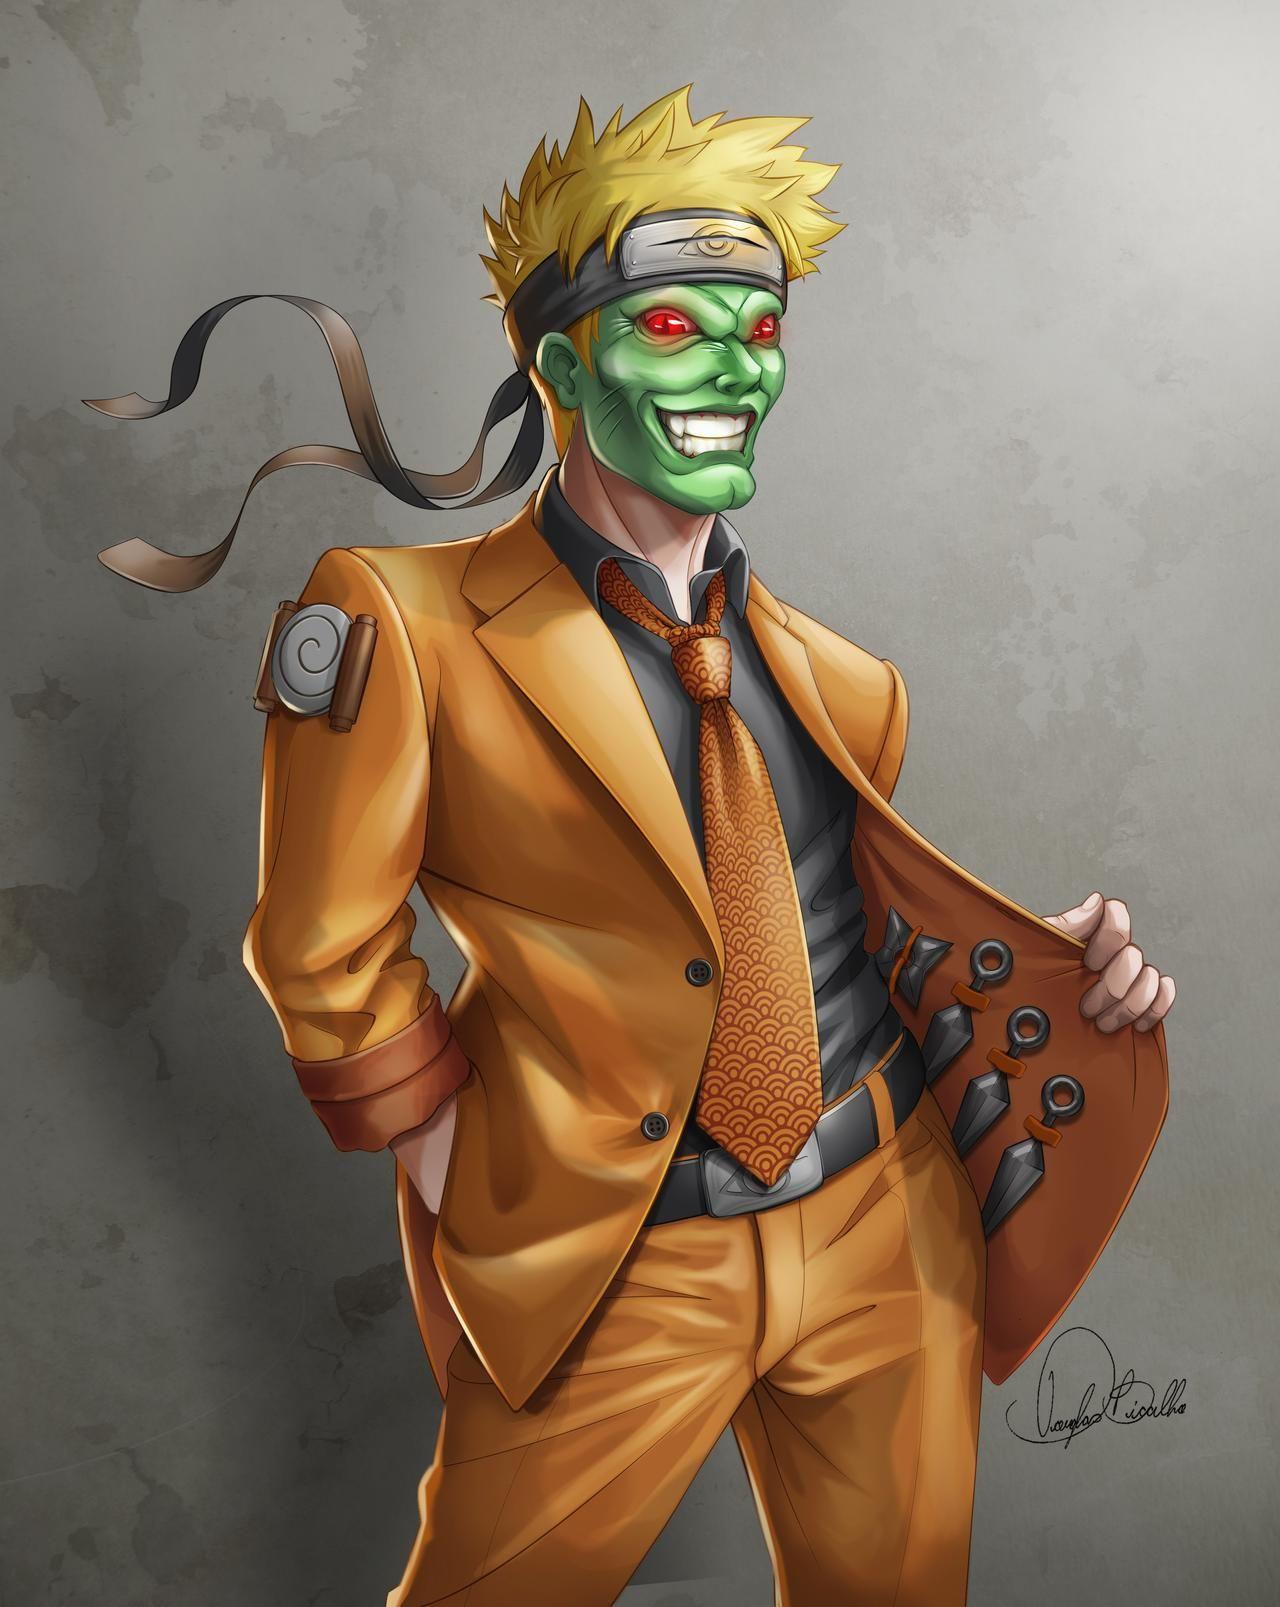 Naruto The Mask By Douglas Bicalho On Deviantart In 2020 Naruto Phone Wallpaper For Men Masked Man